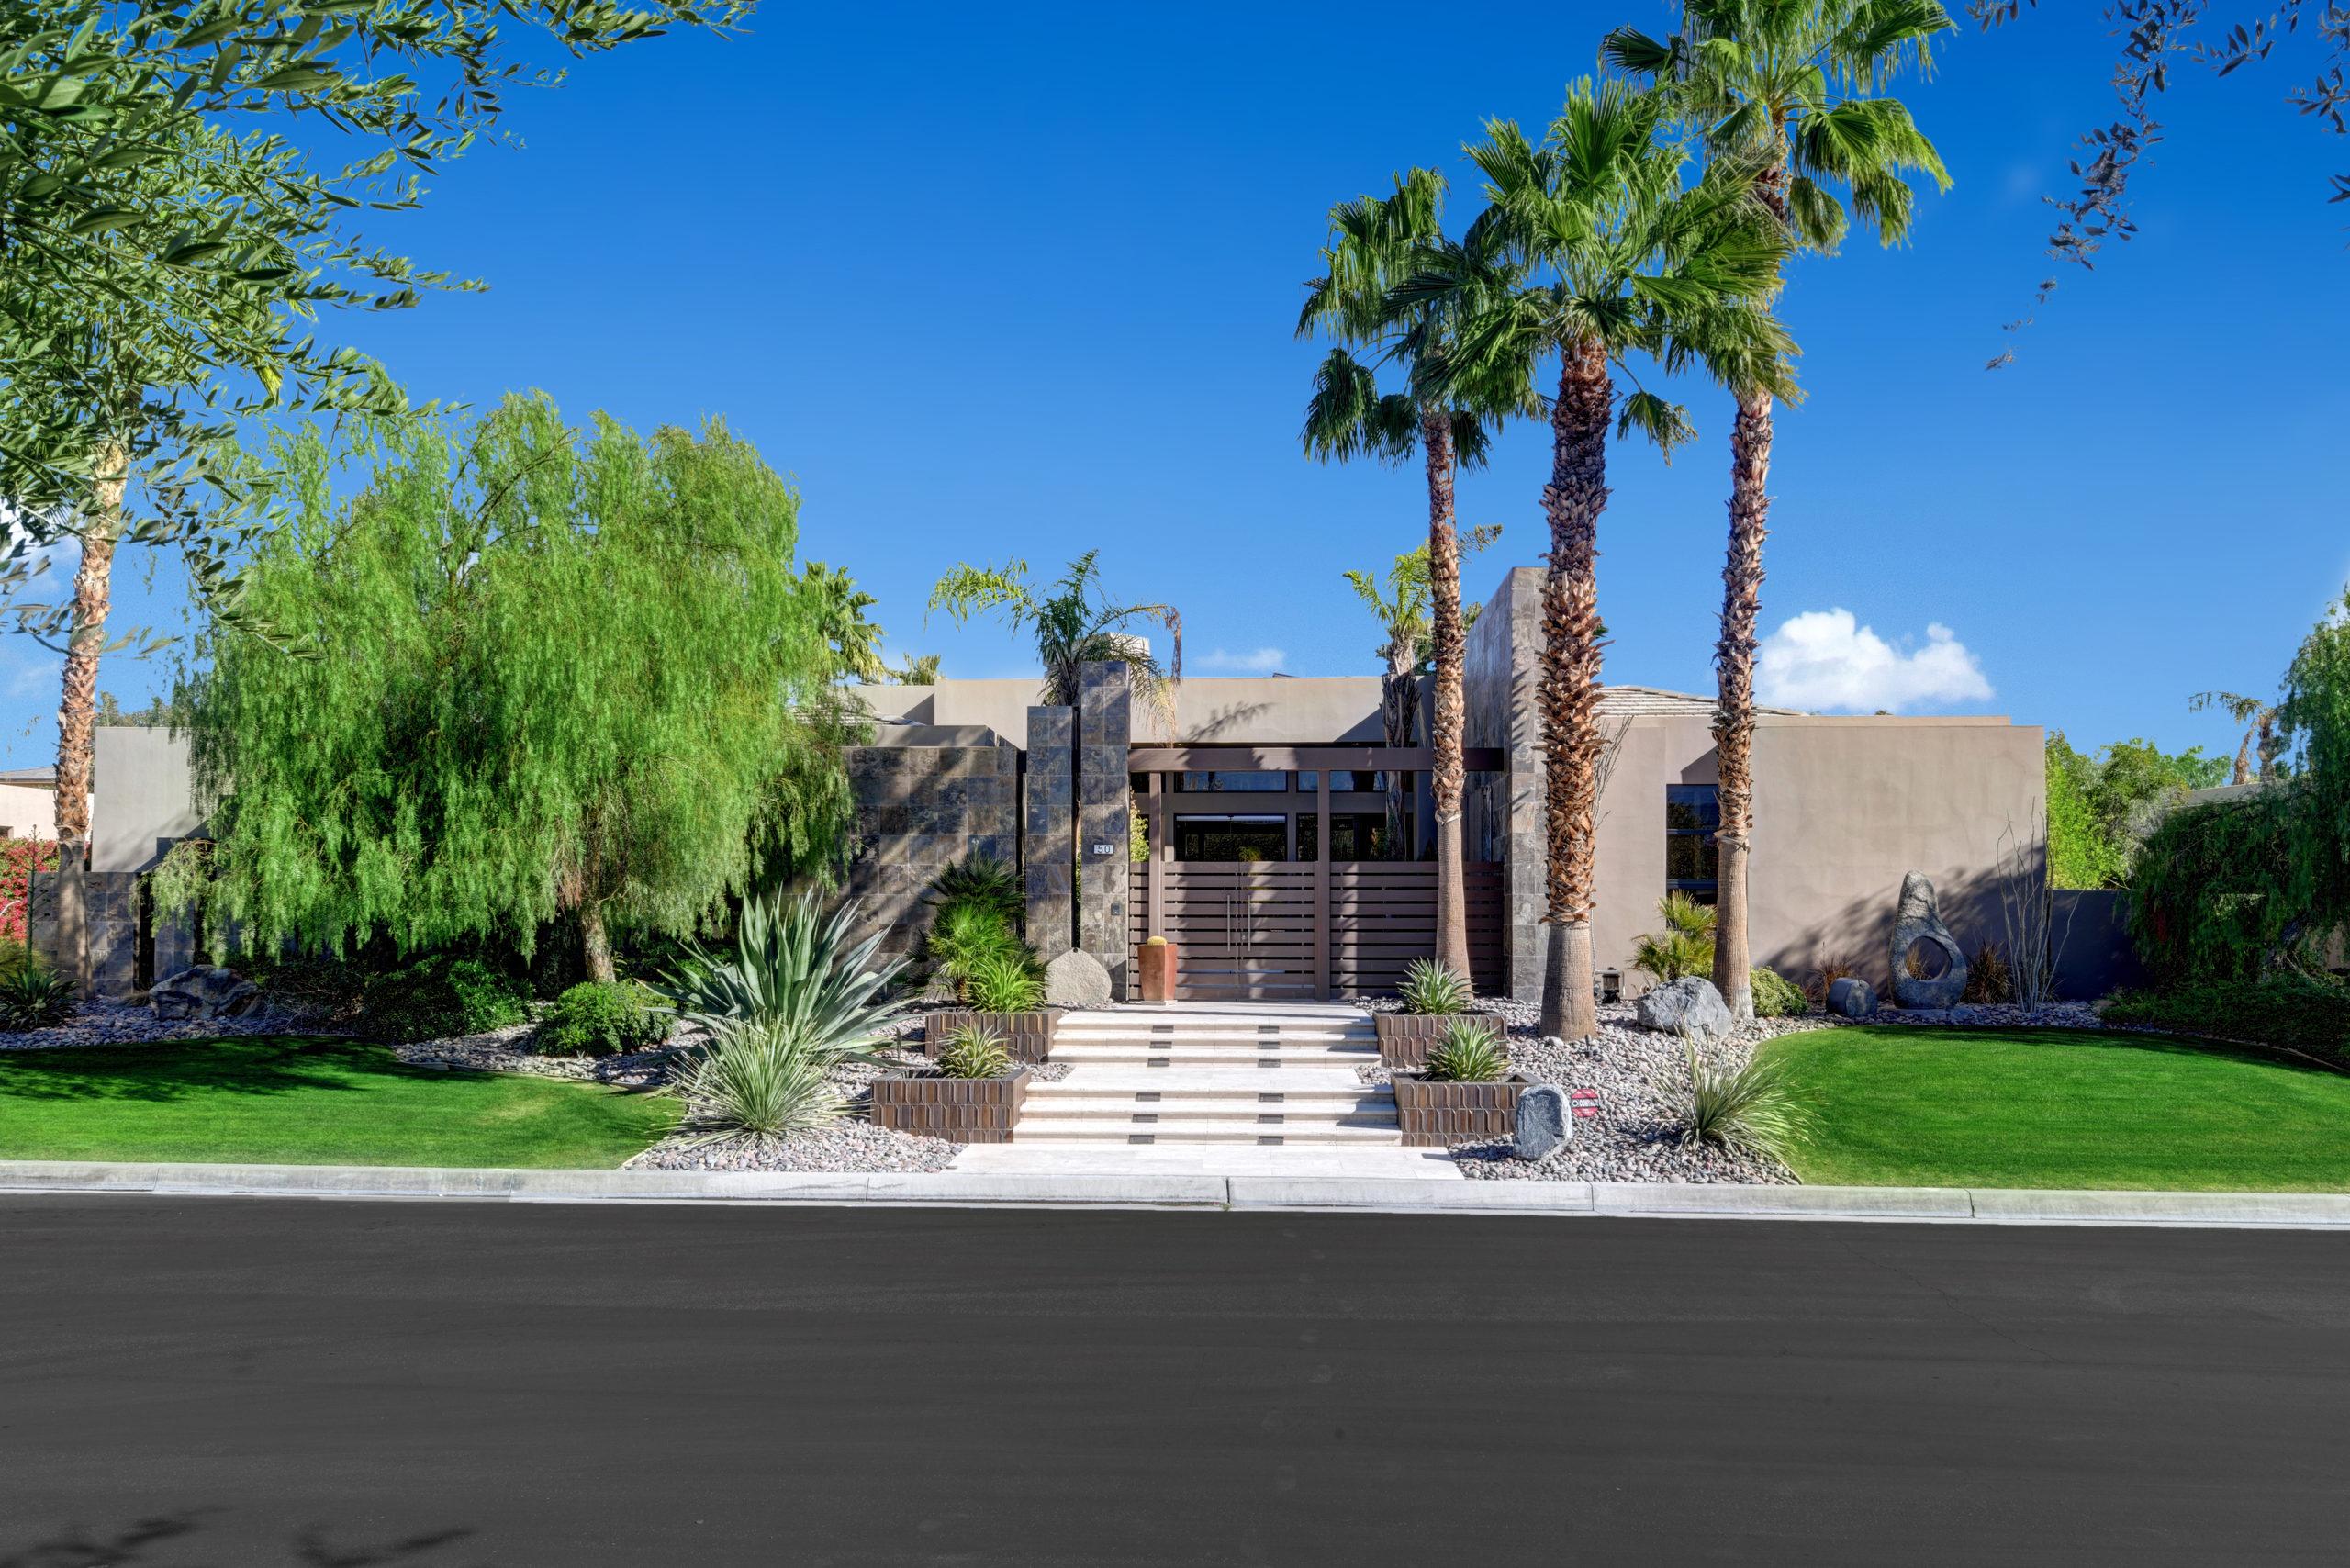 50 Ambassador Cir, Rancho Mirage, Ca 92270